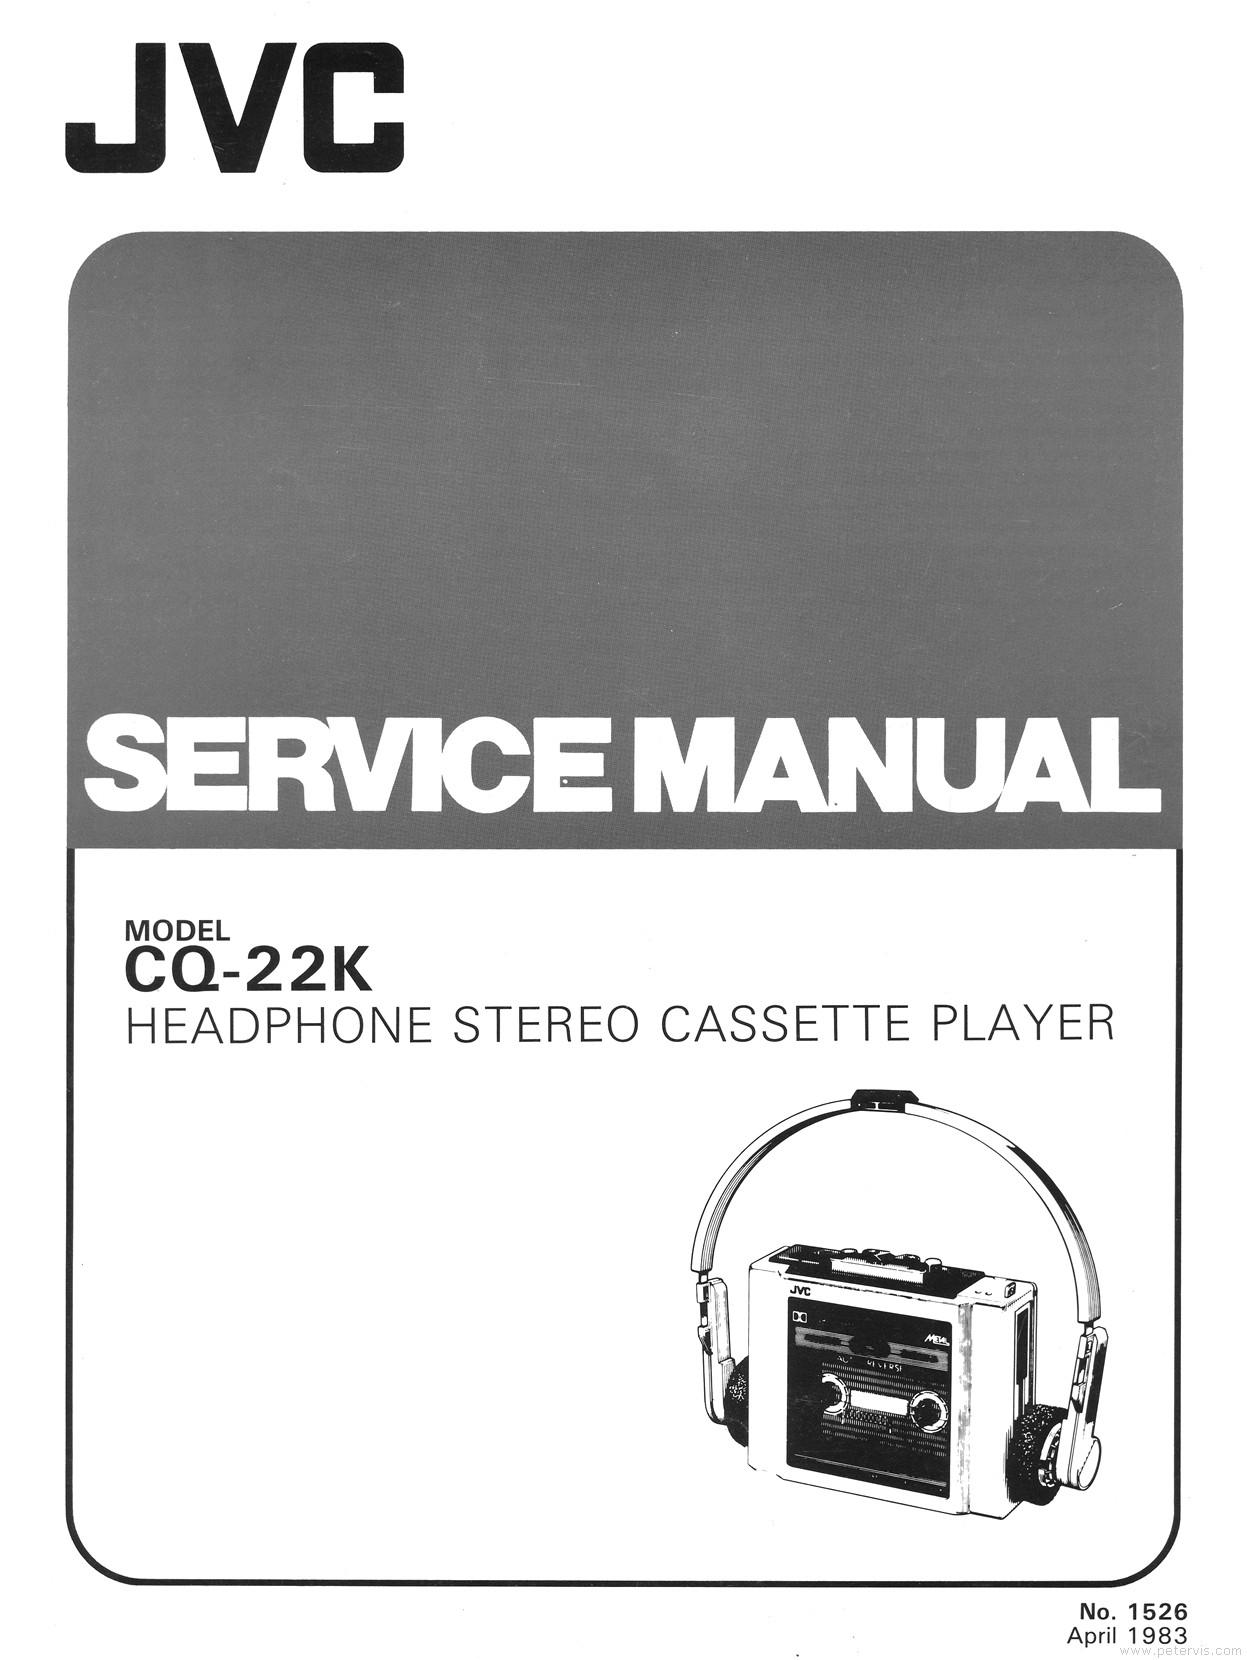 JVC CQ-22K Service Manual